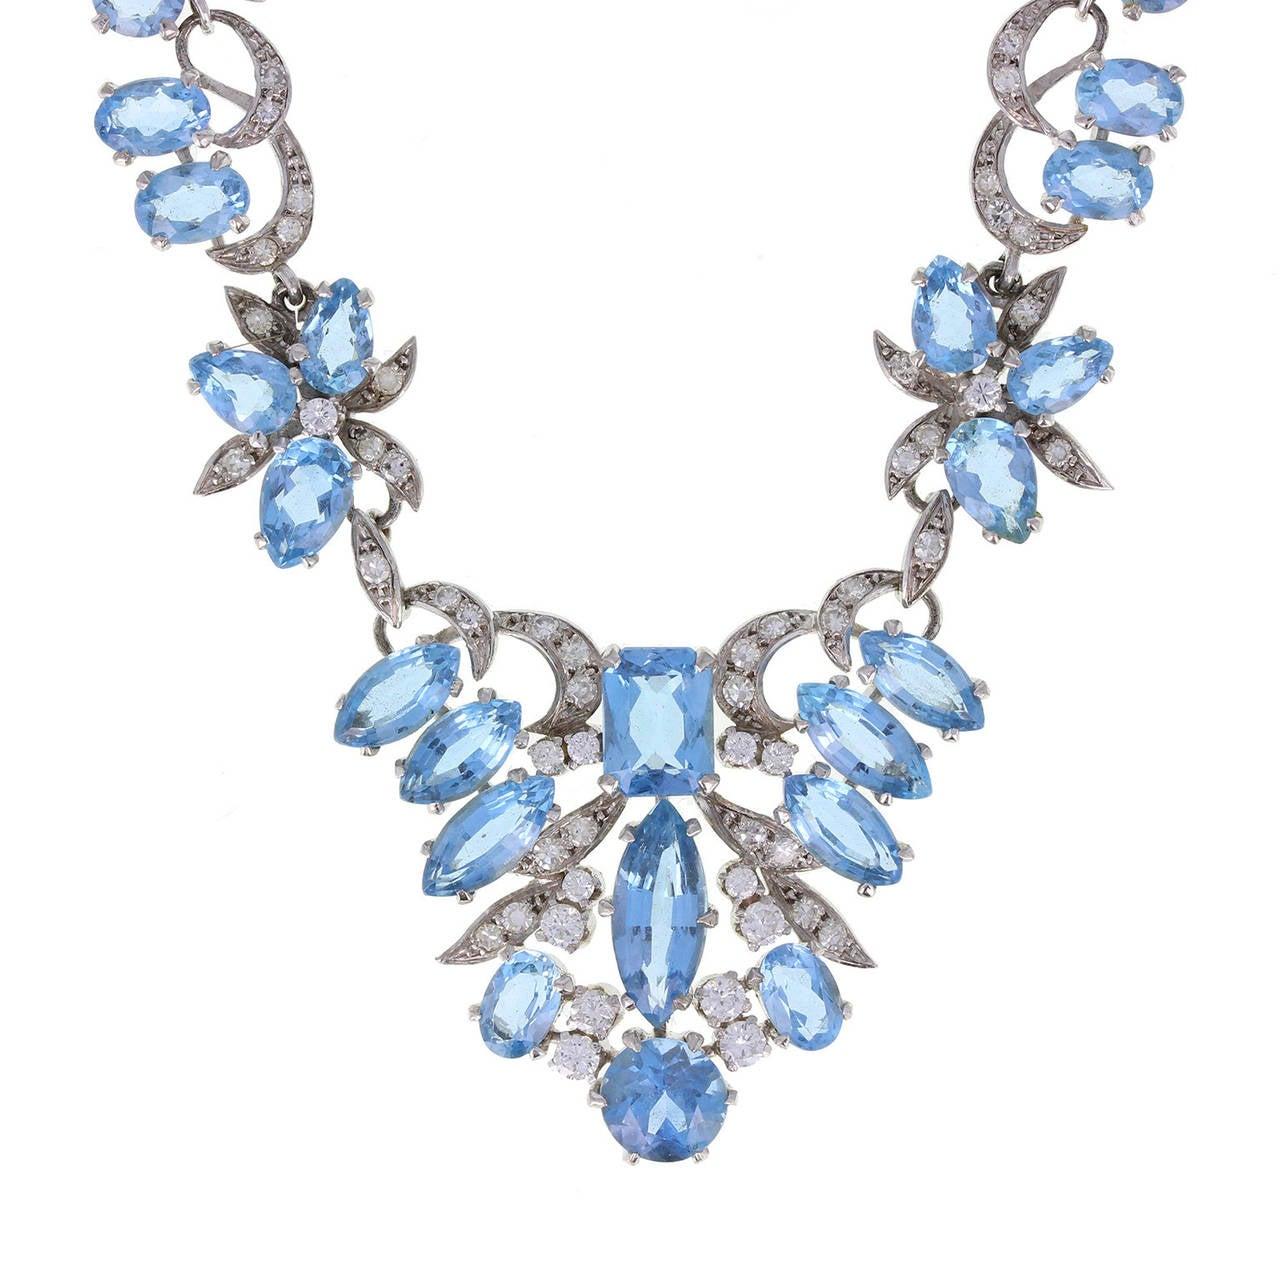 1950s Harrods London Aquamarine Diamond Gold Necklace 2